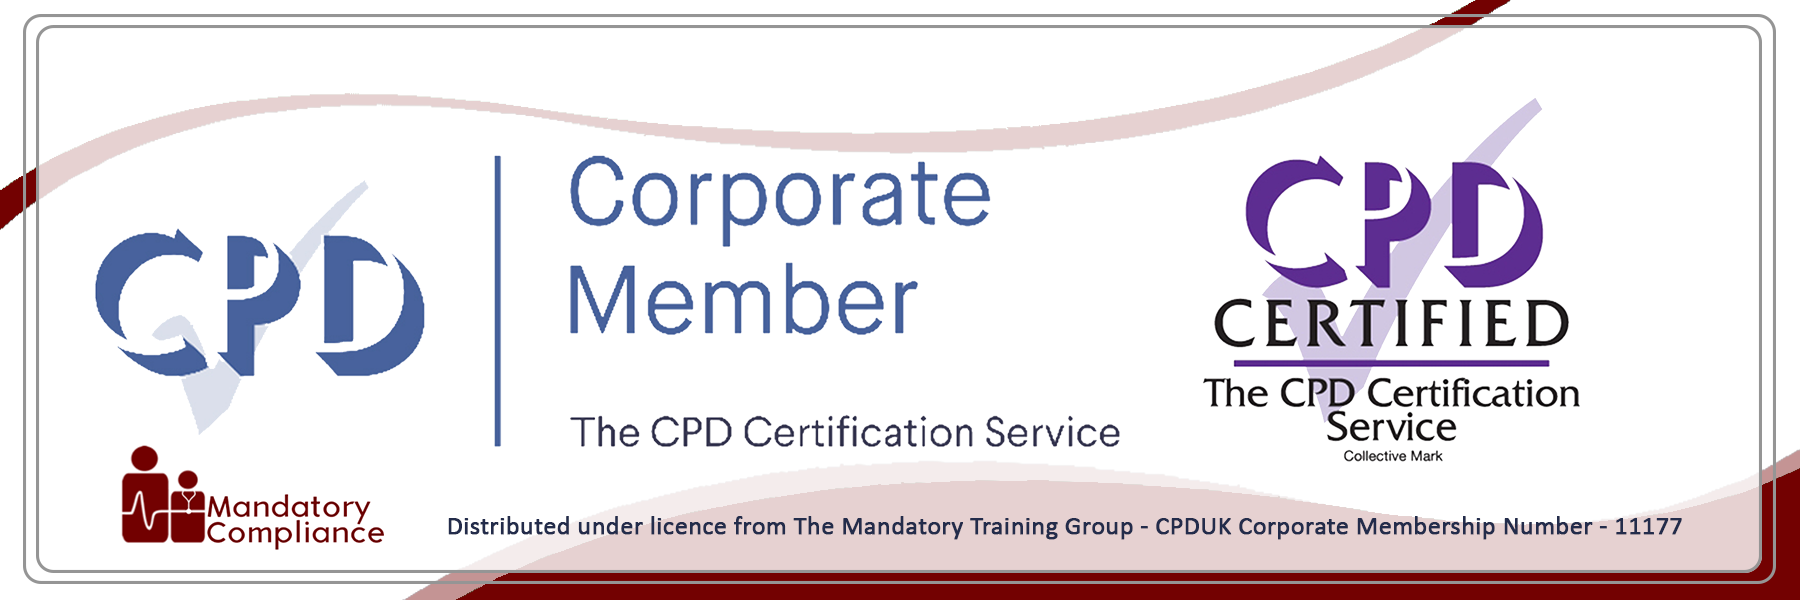 Project Management Essentials - Online Training Courses - Mandatory Compliance UK -